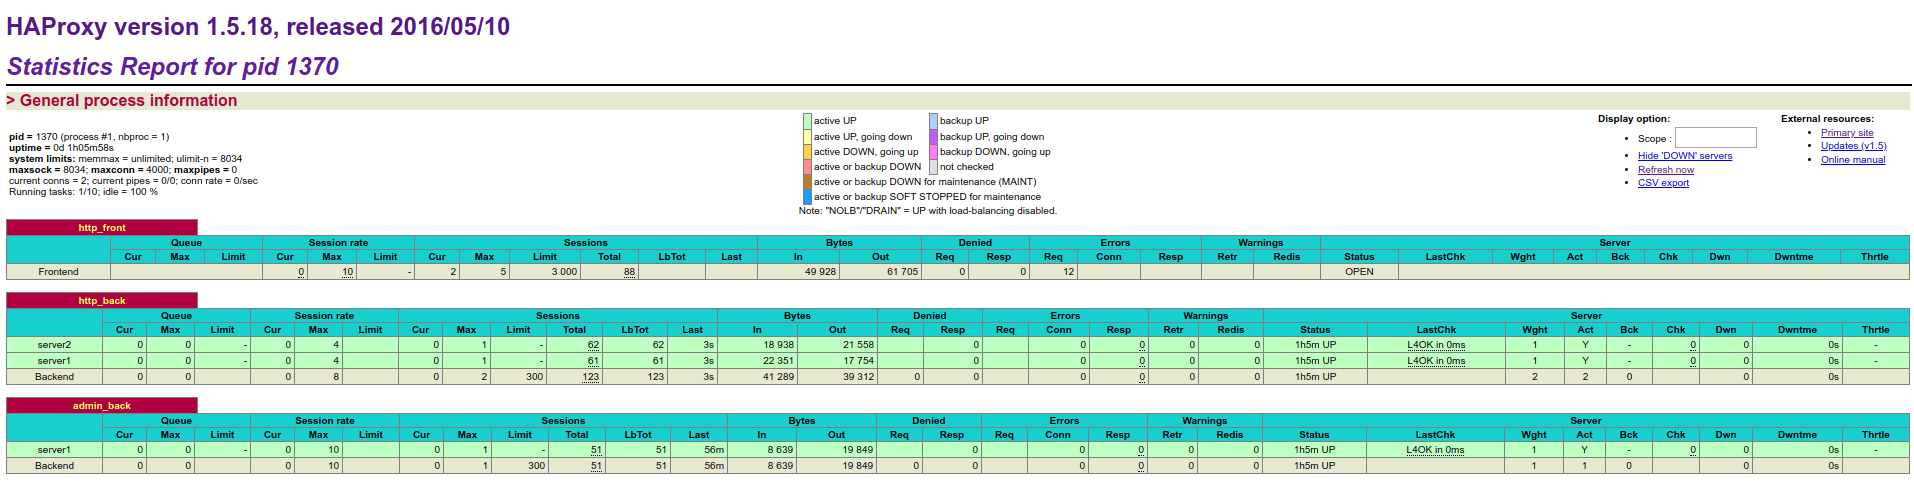 Haproxy Statistics Report